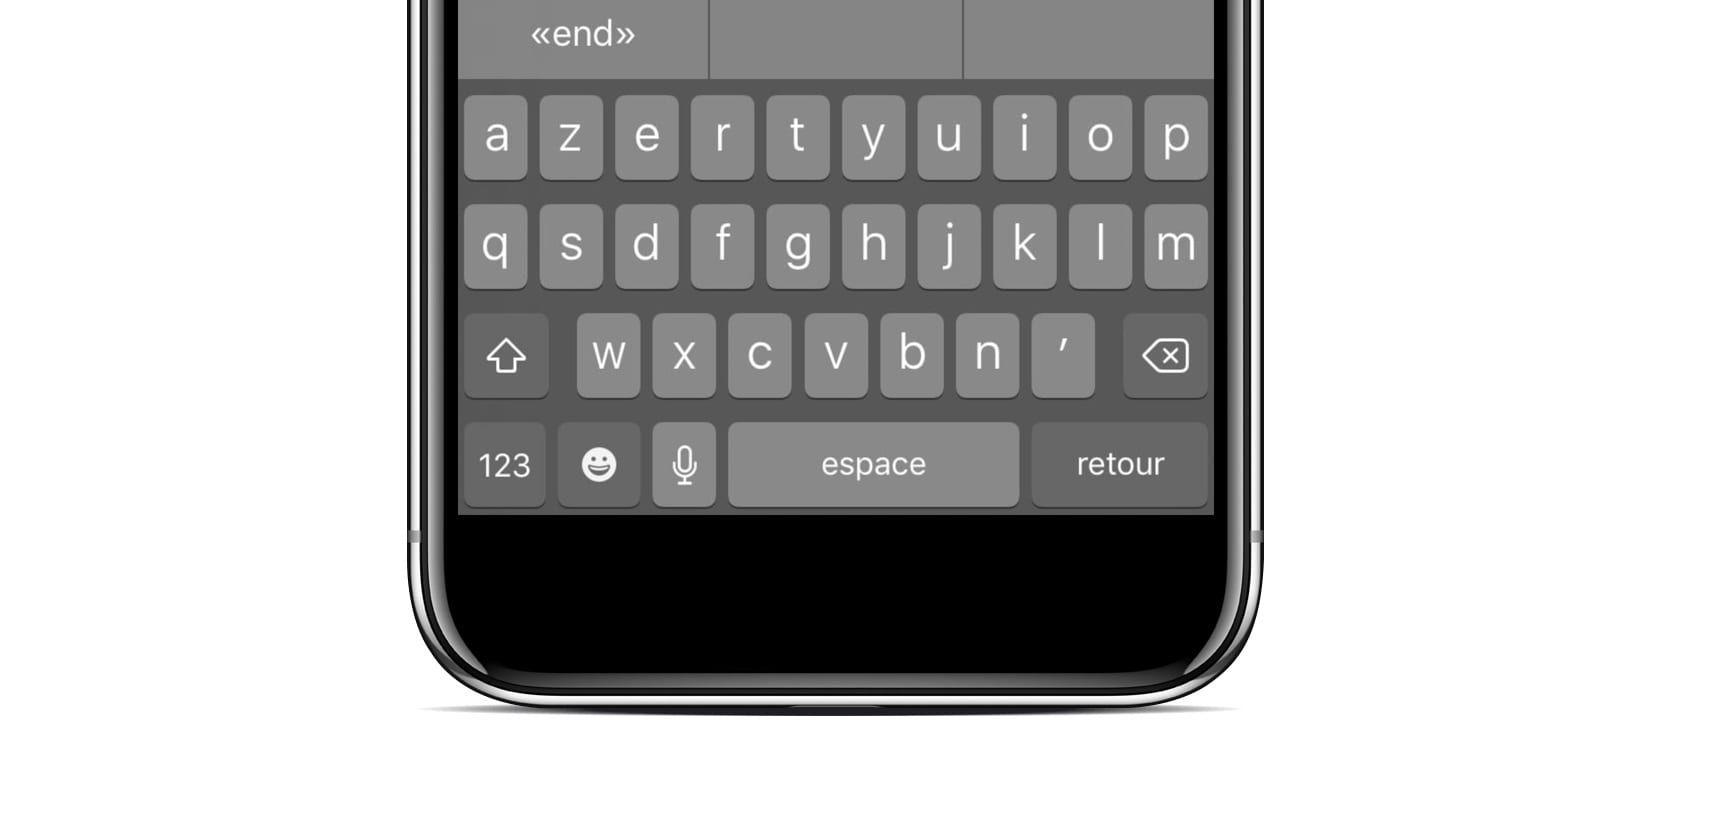 Get a dark keyboard on iphone with this free cydia tweak